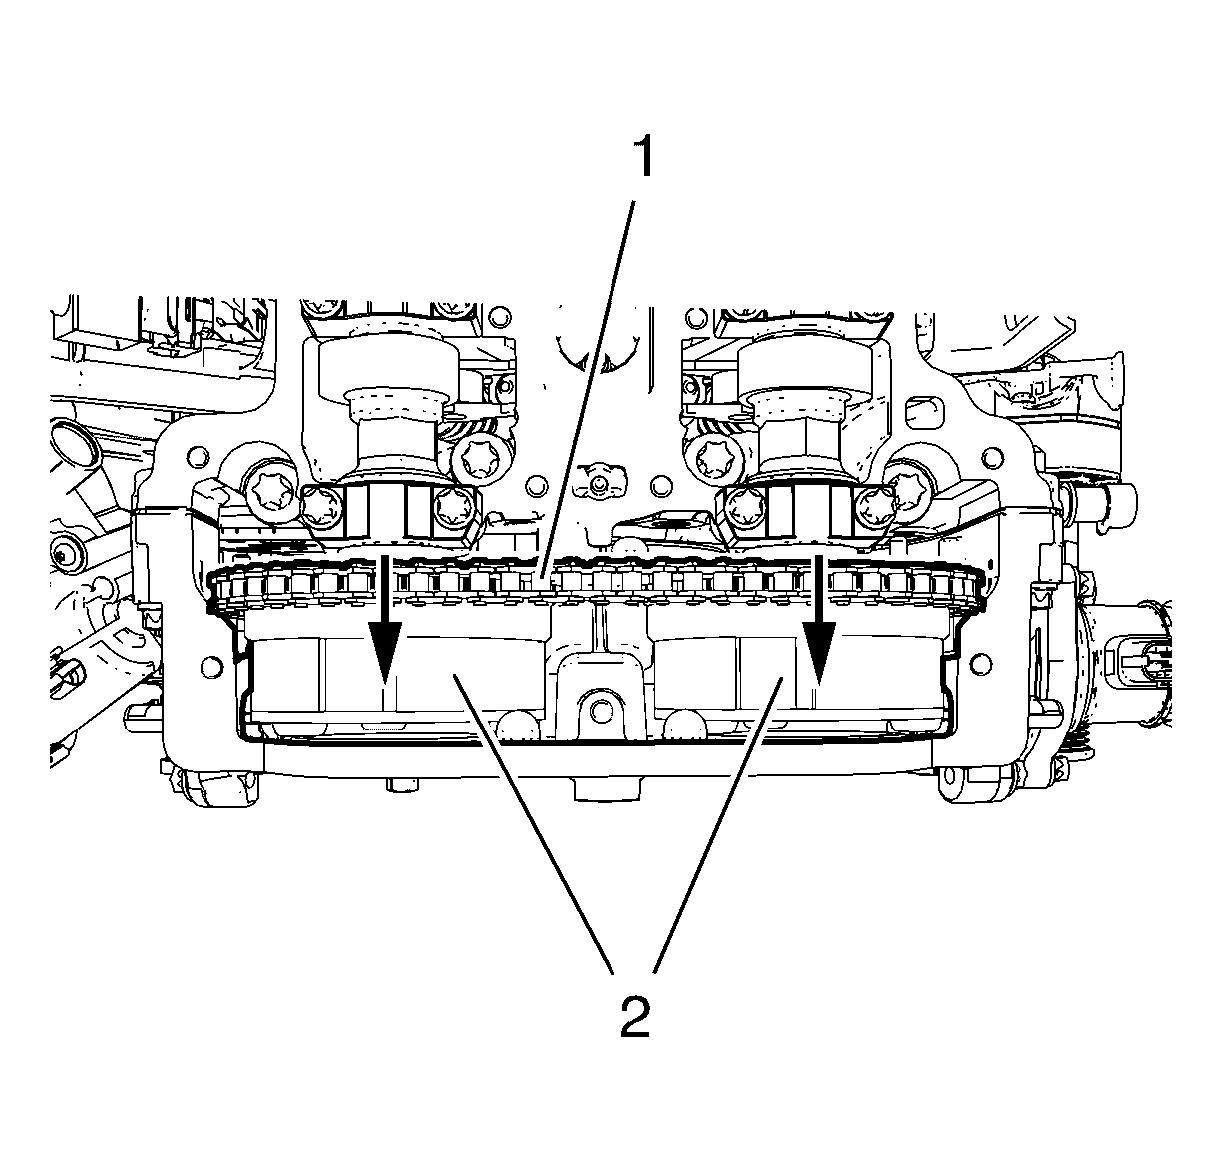 2001daewooleganzaenginediagram 2000 Daewoo Leganza Engine Diagram